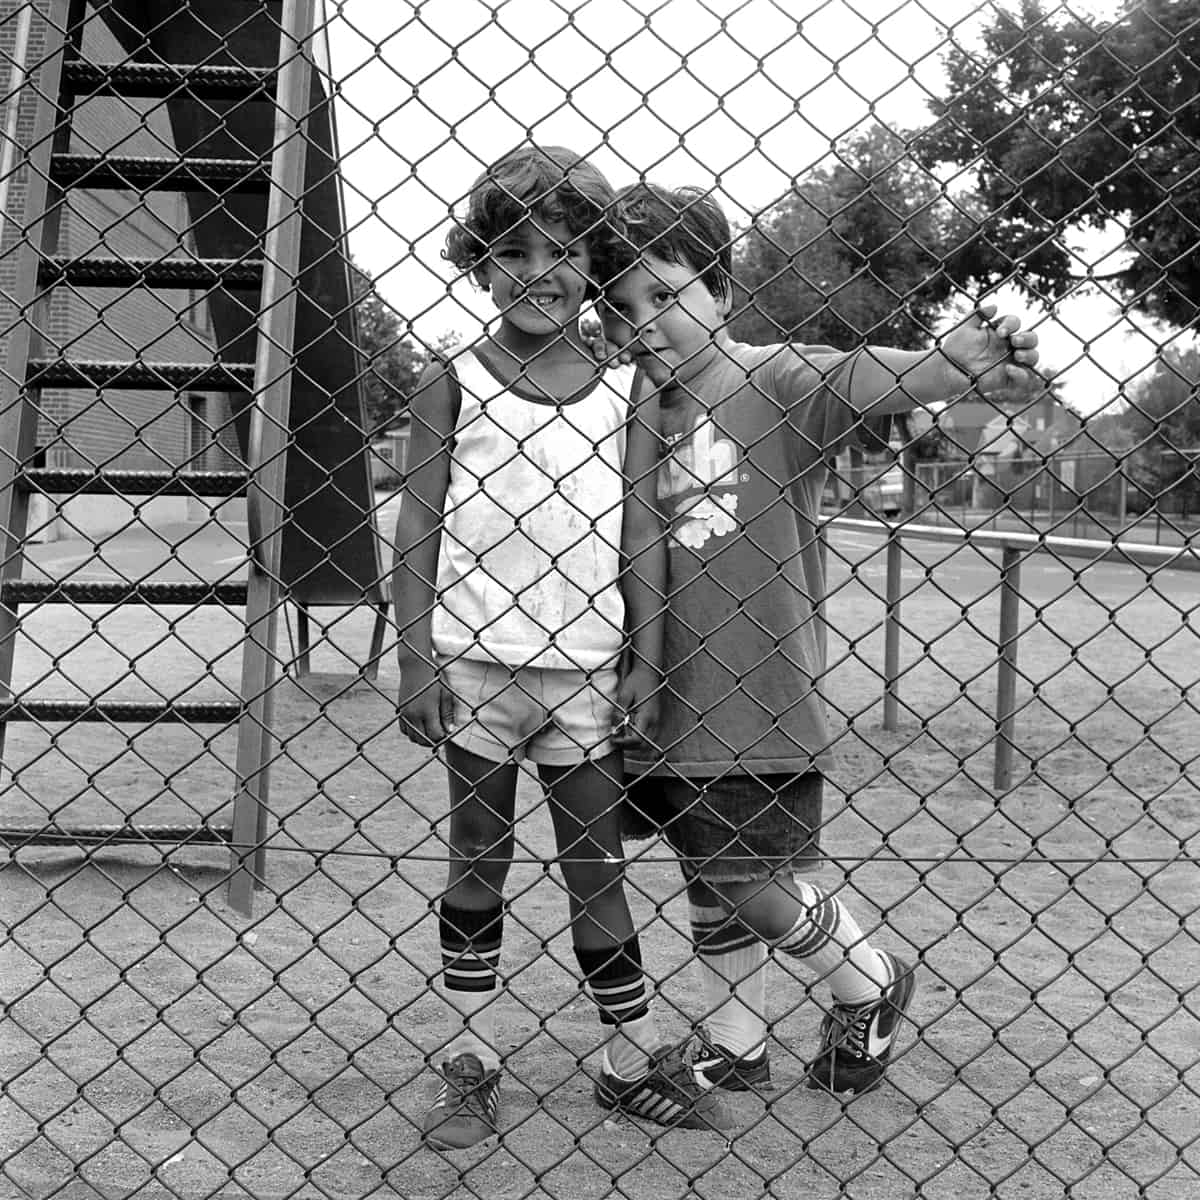 Chad & Bradley, Denver, 1978 Photographie ©Ricardo Bloch